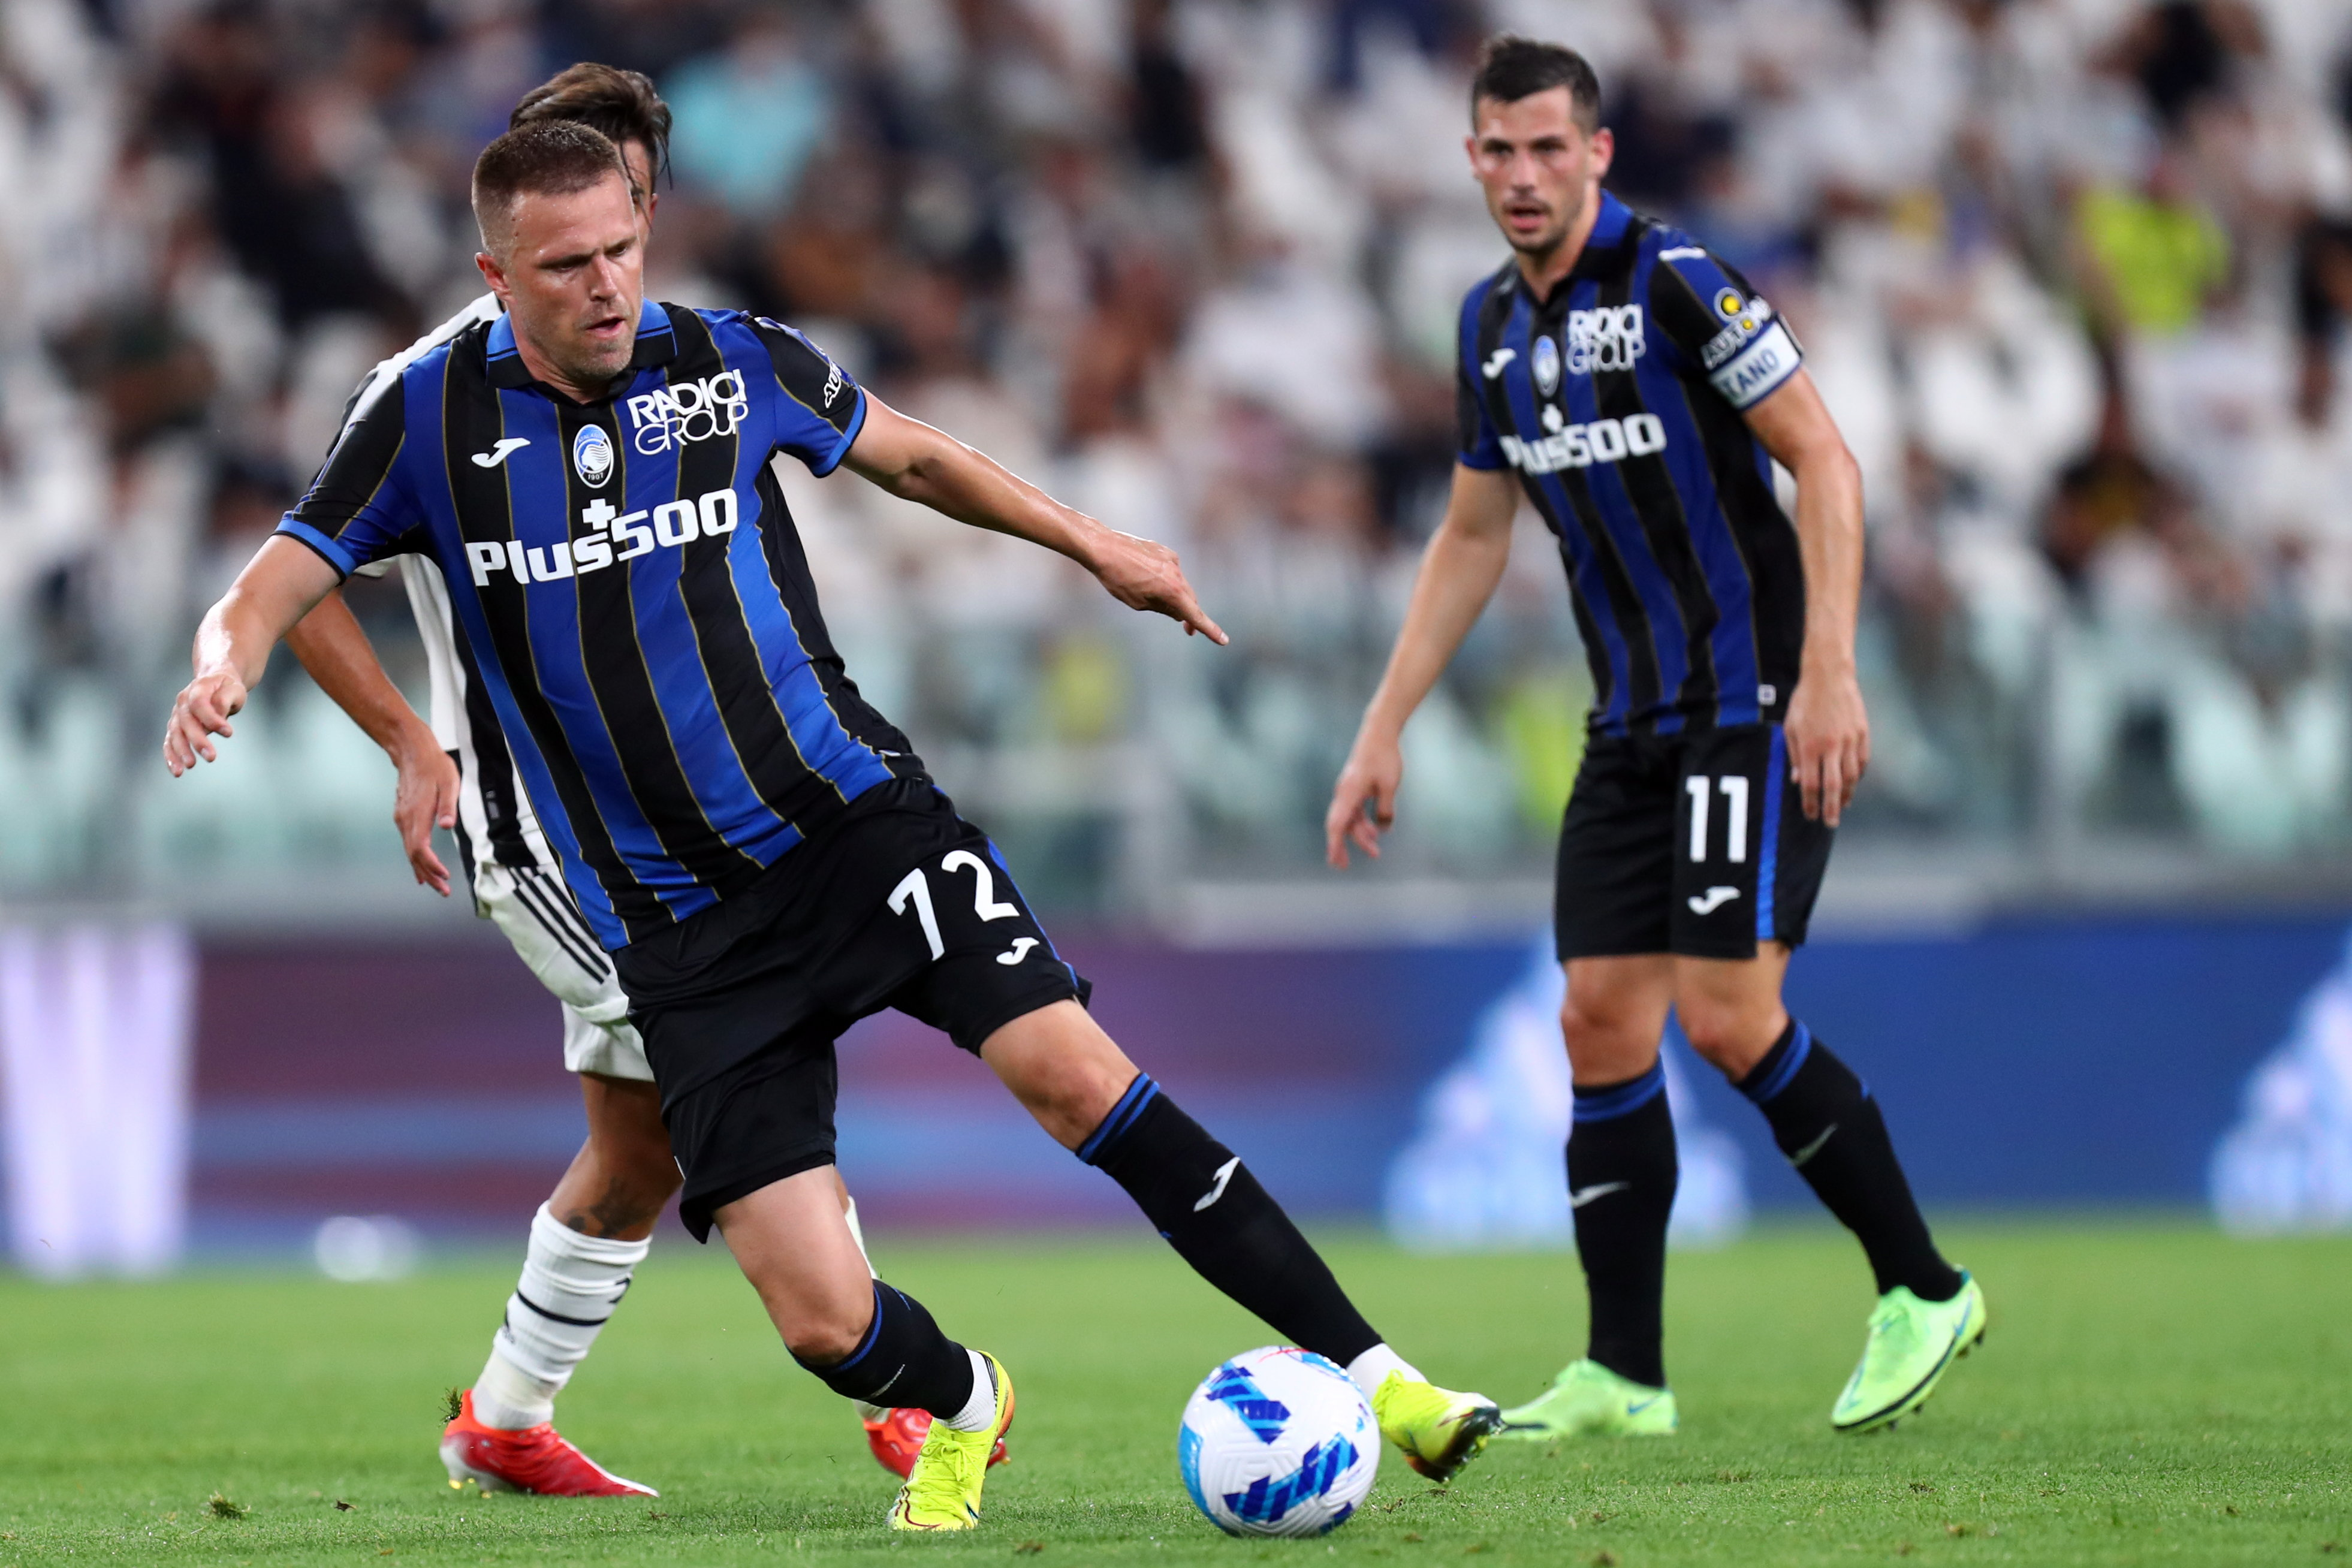 Juventus v Atalanta Bergamo - Pre-Season Friendly Match